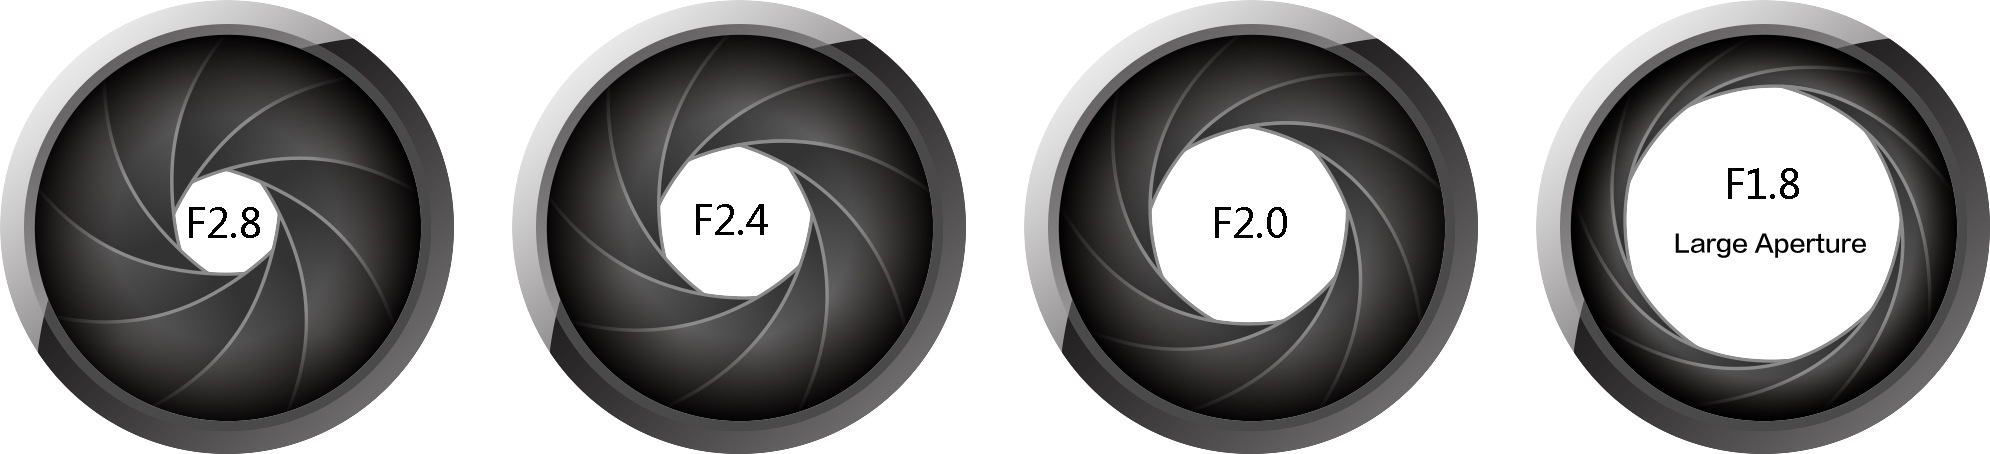 yi-dashcam-largeaperture